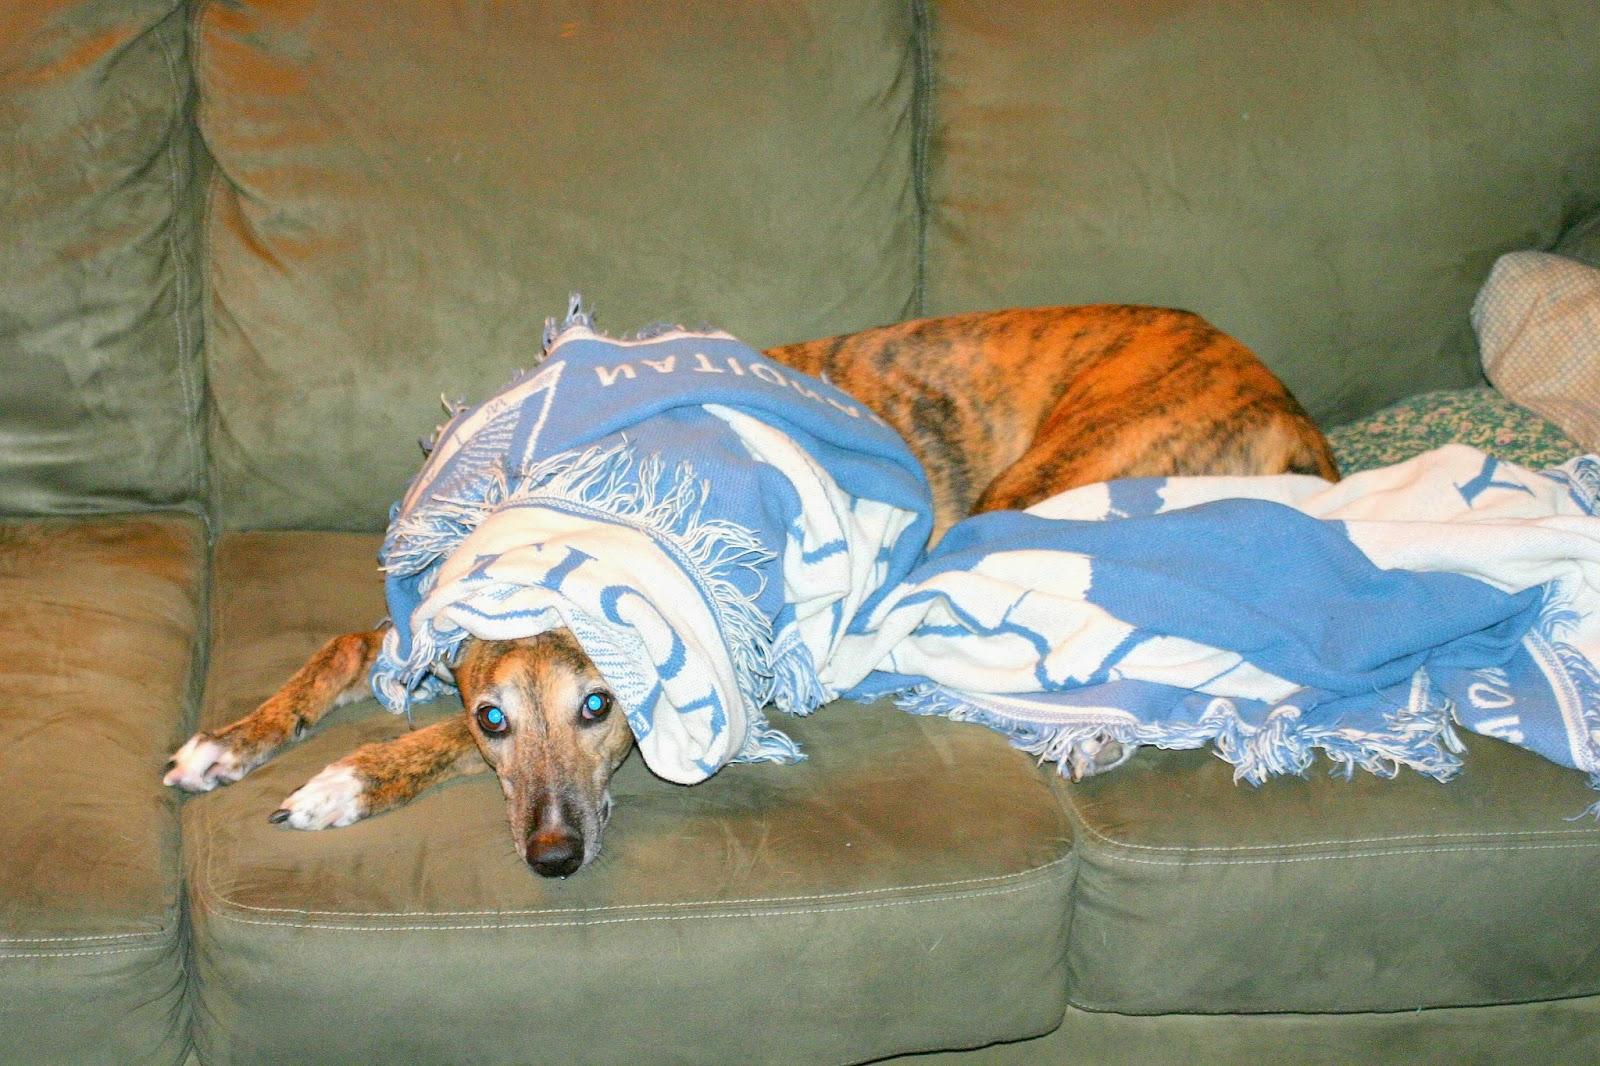 Girly Girl Greyhound under cover